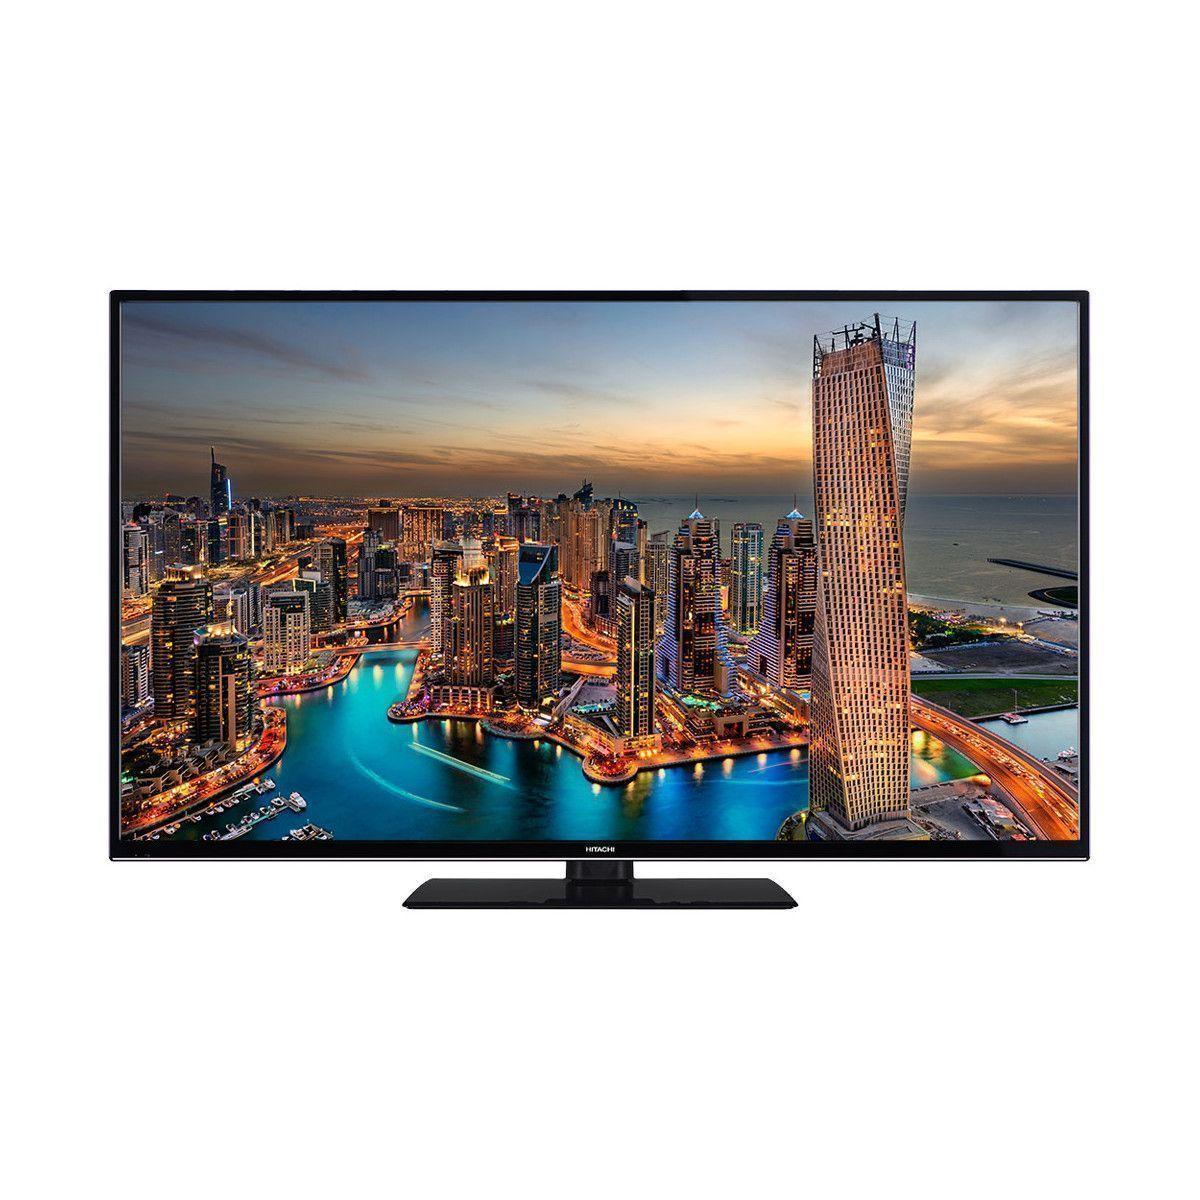 Apathetic Smart Tv Guys Tvprogram Smarttvworld Samsung Tvs Samsung Led